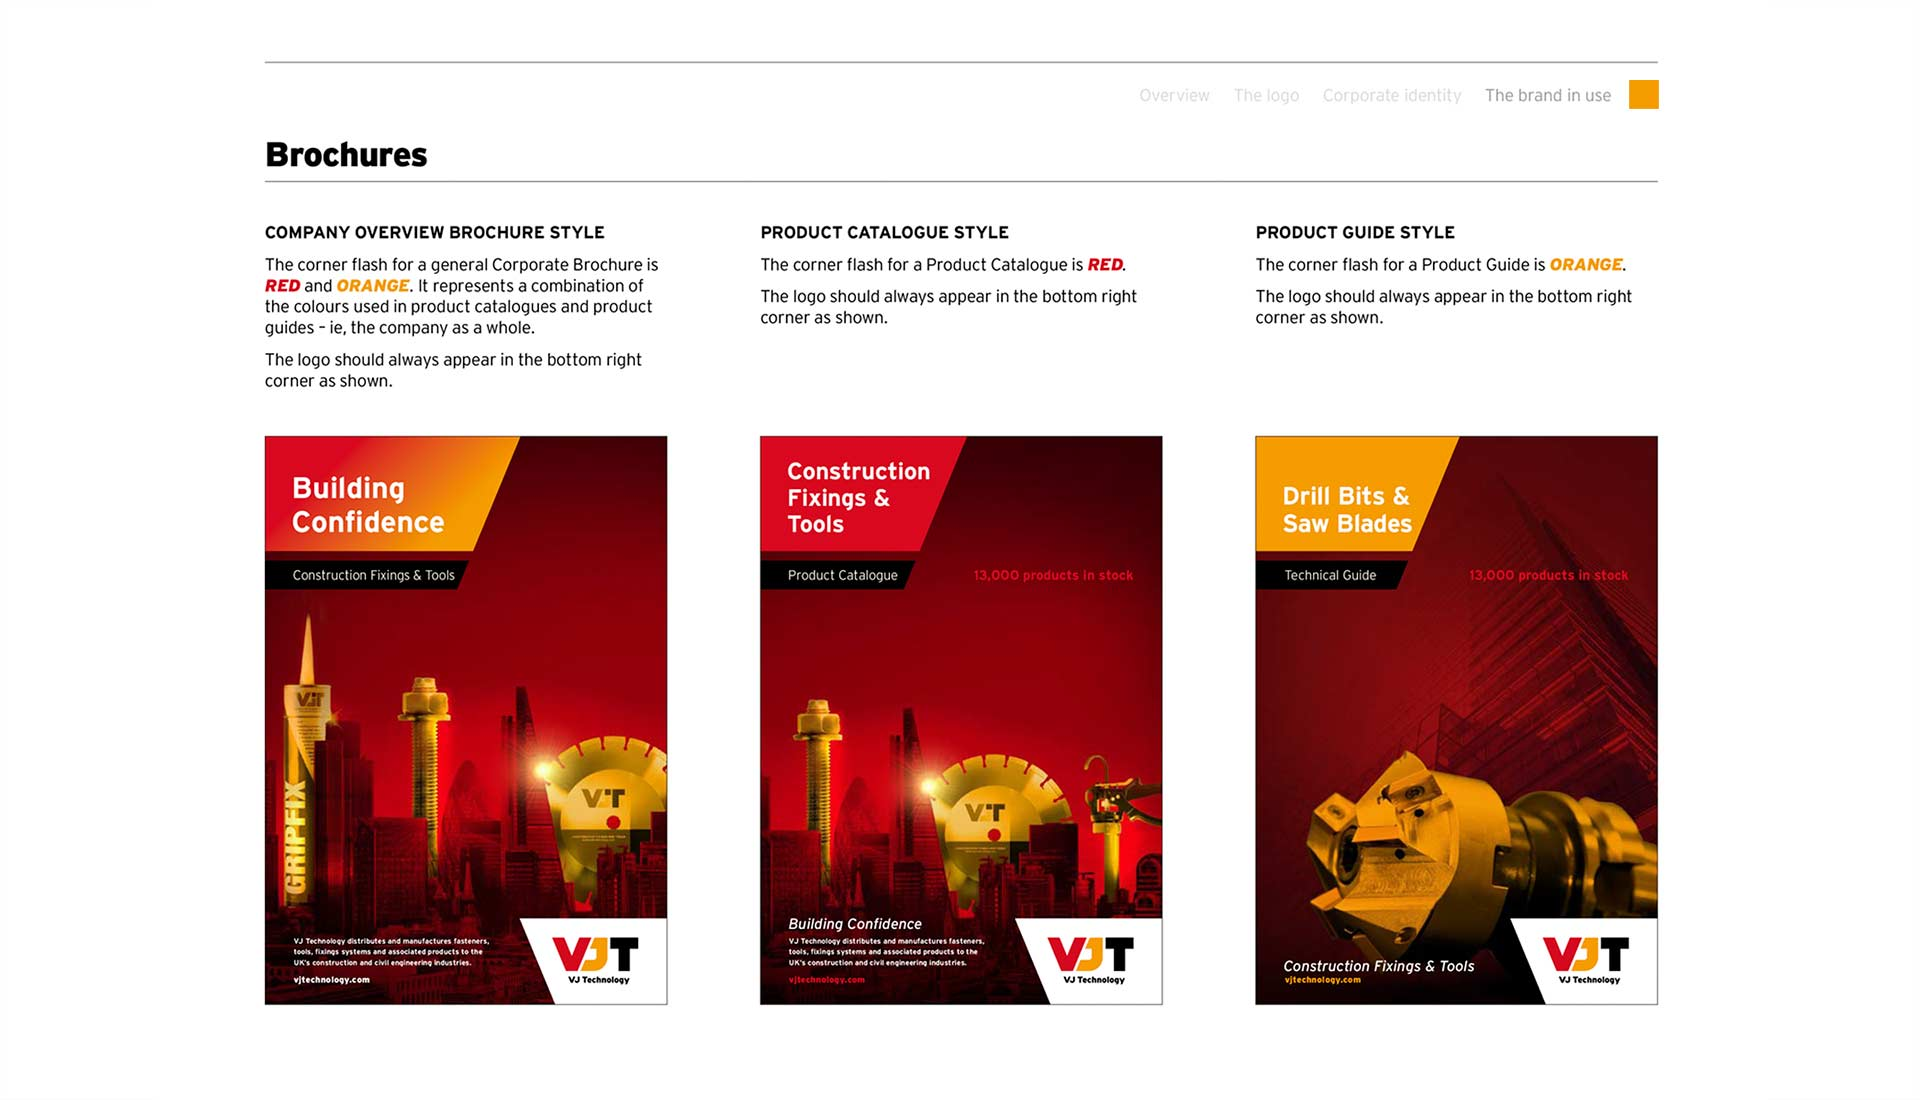 VJ Technology Brand Guidelines Brochures